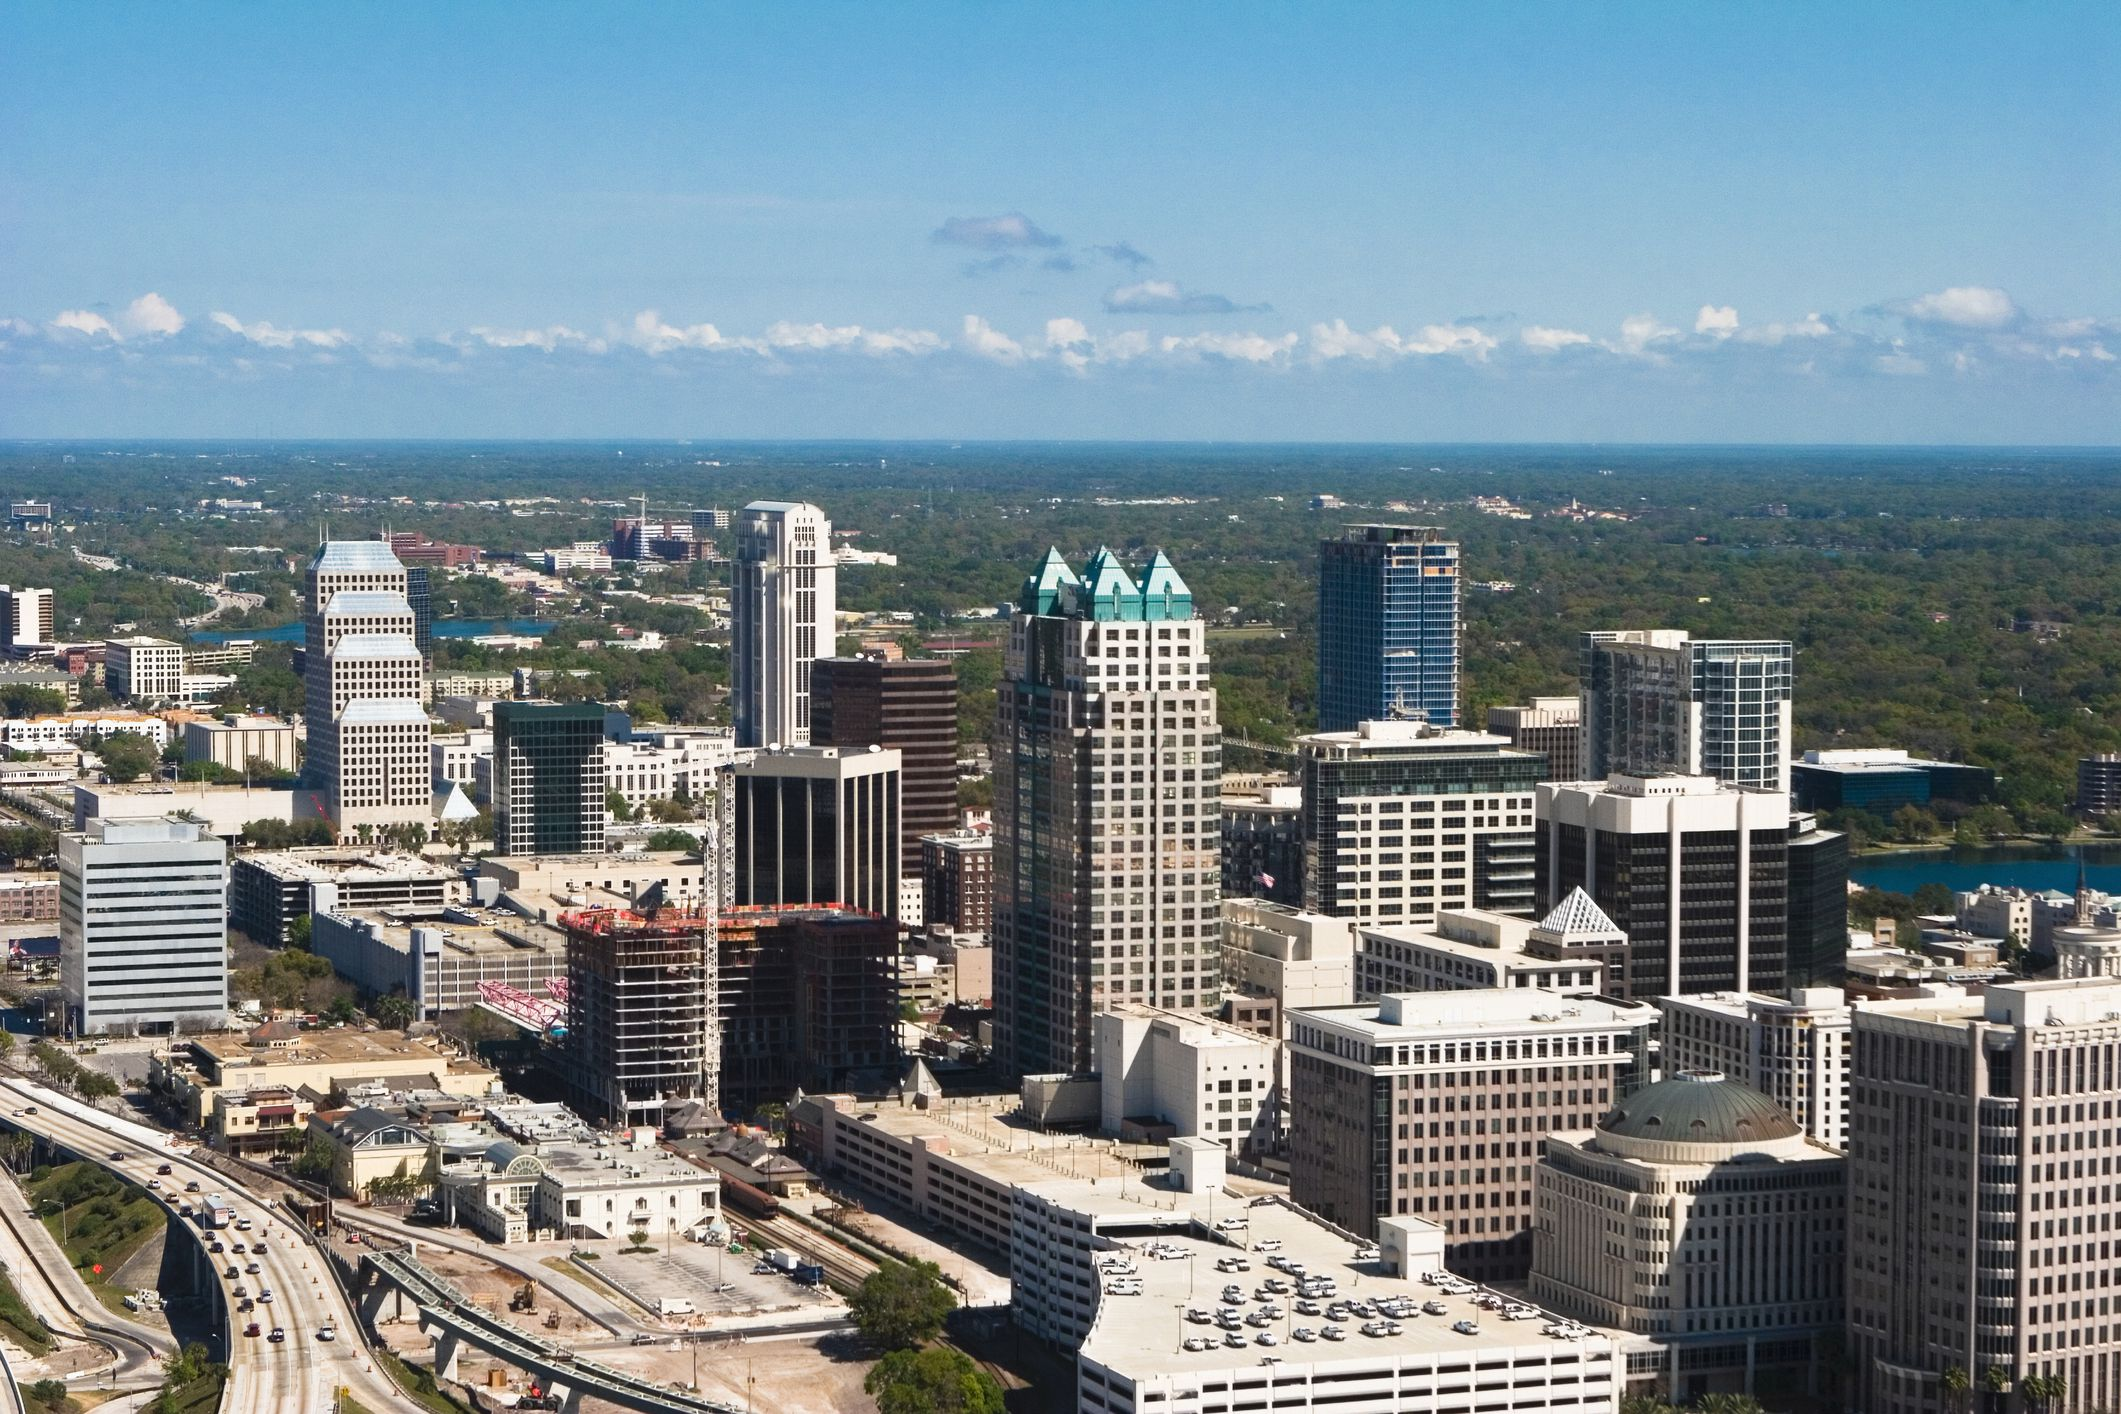 Community Colleges In The Orlando Area